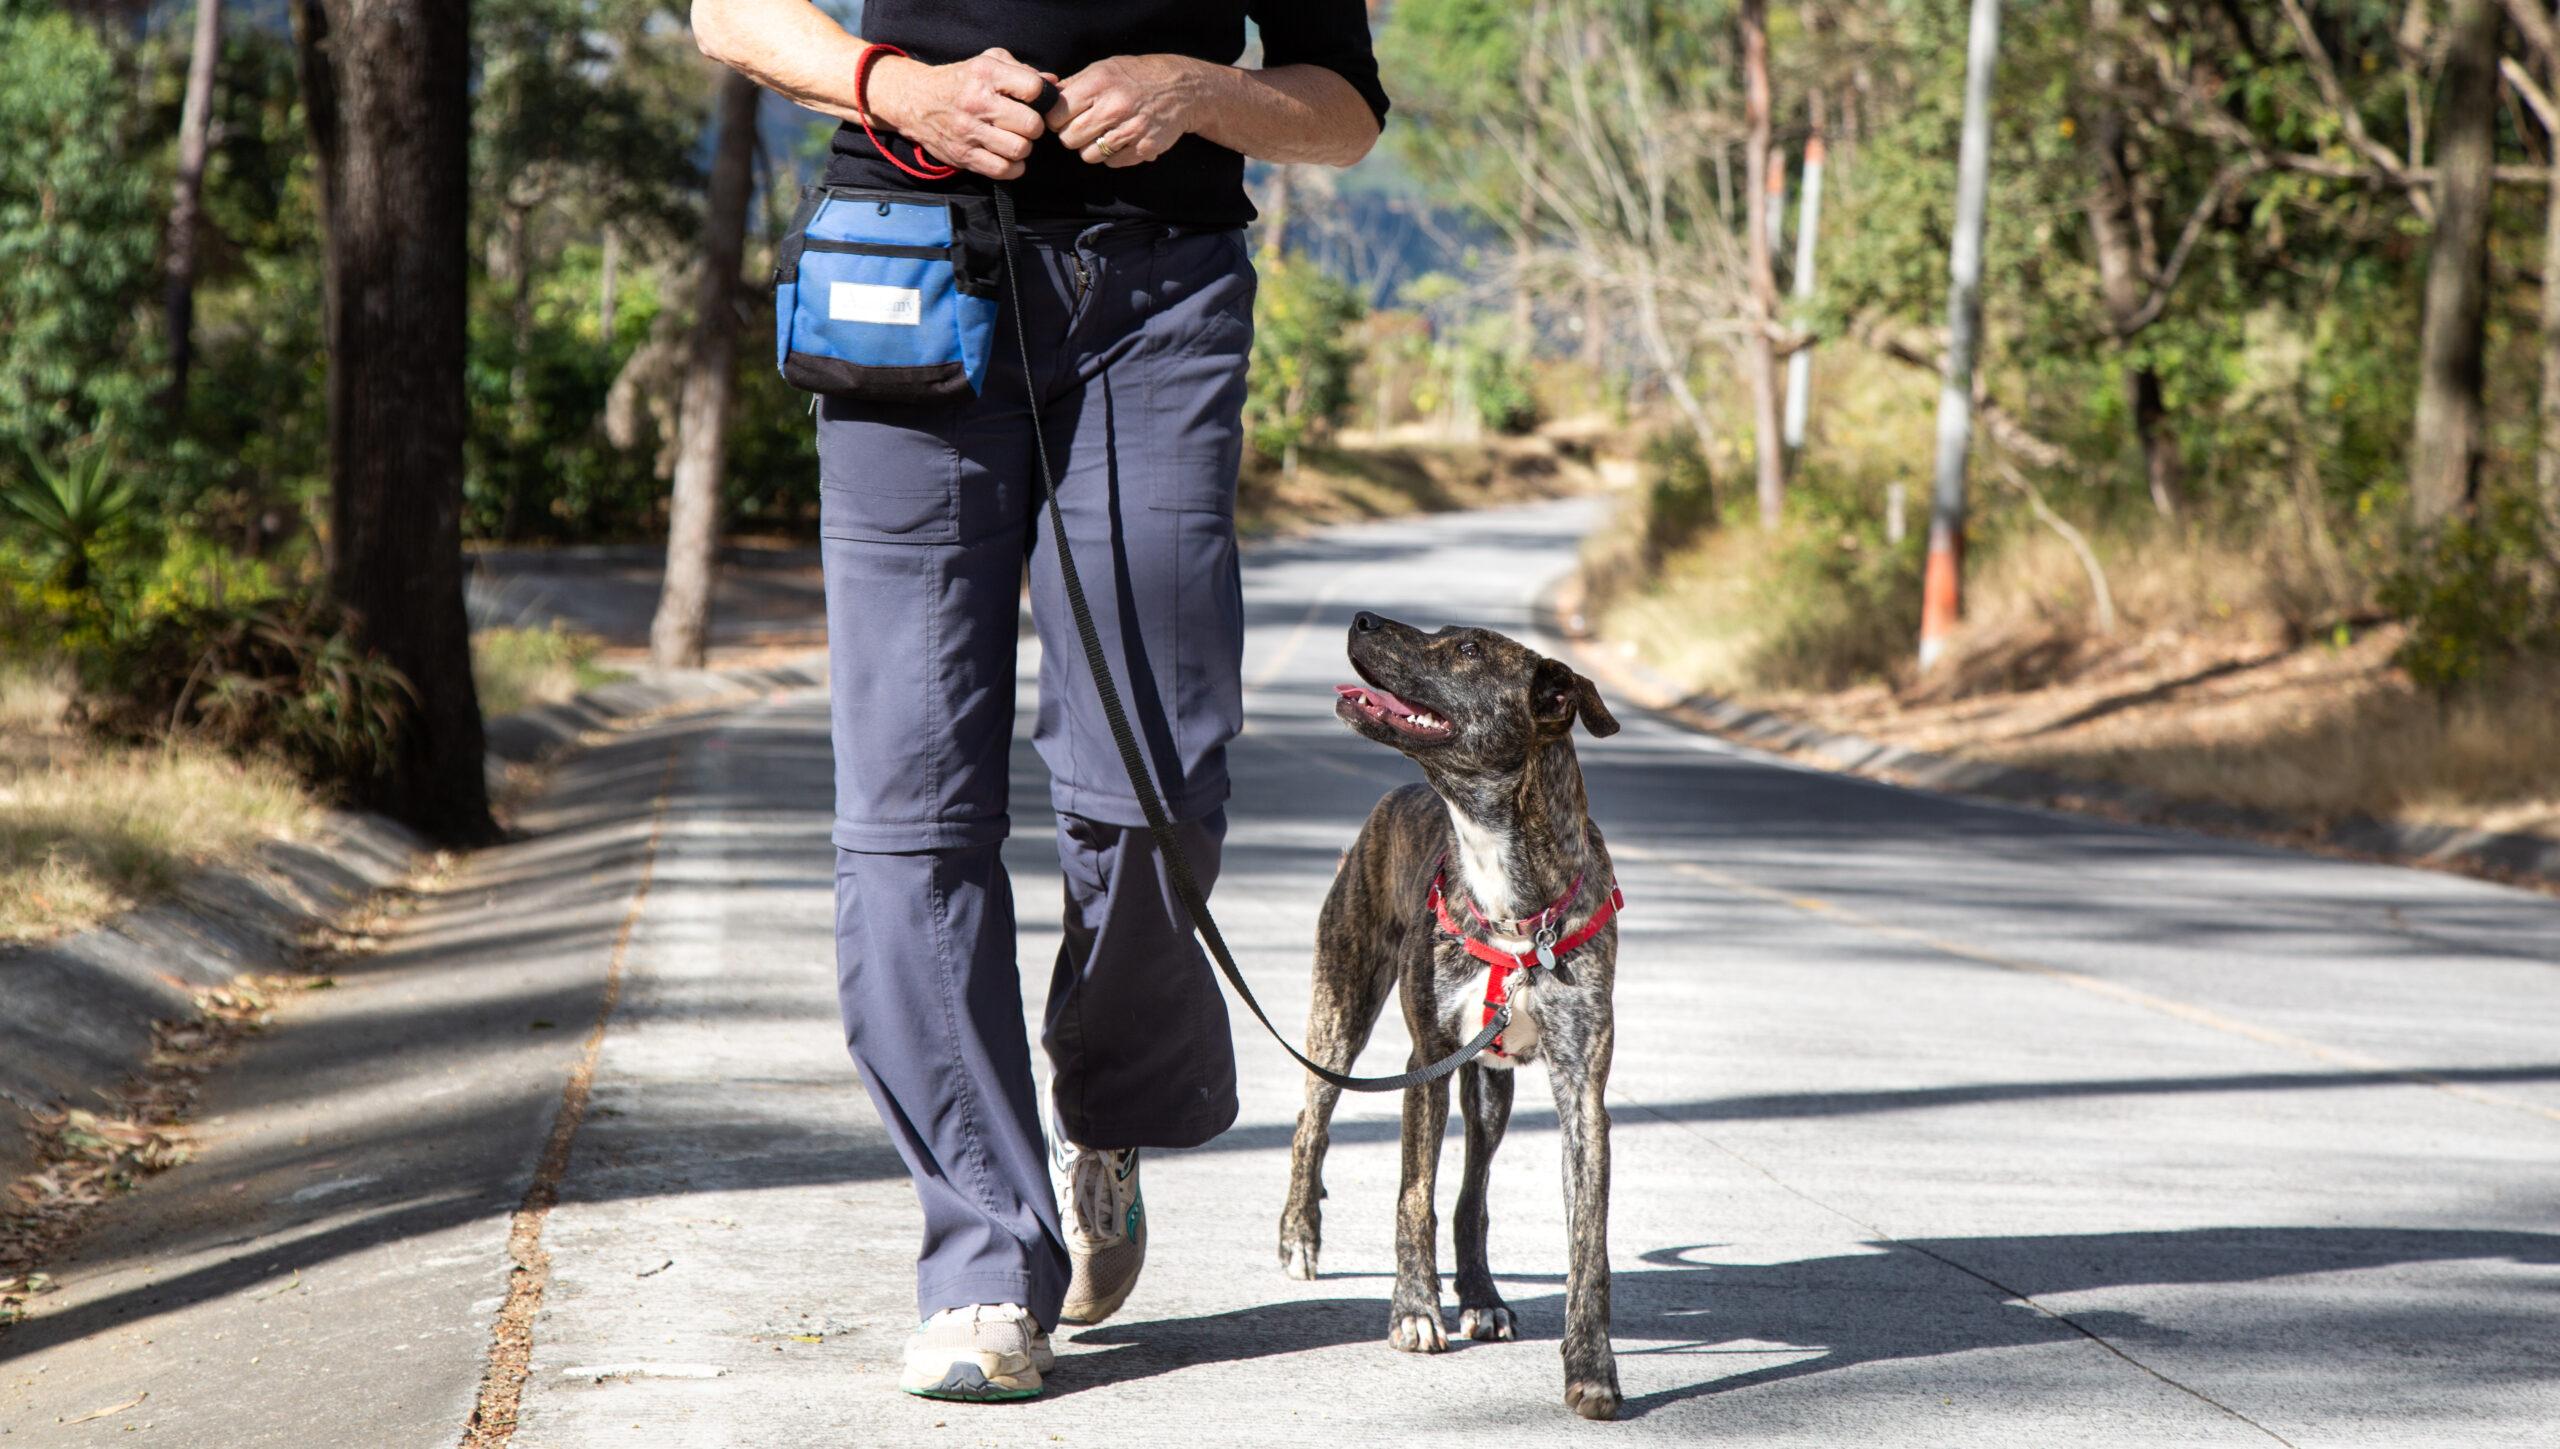 Linda walking a dog on a loose leash.